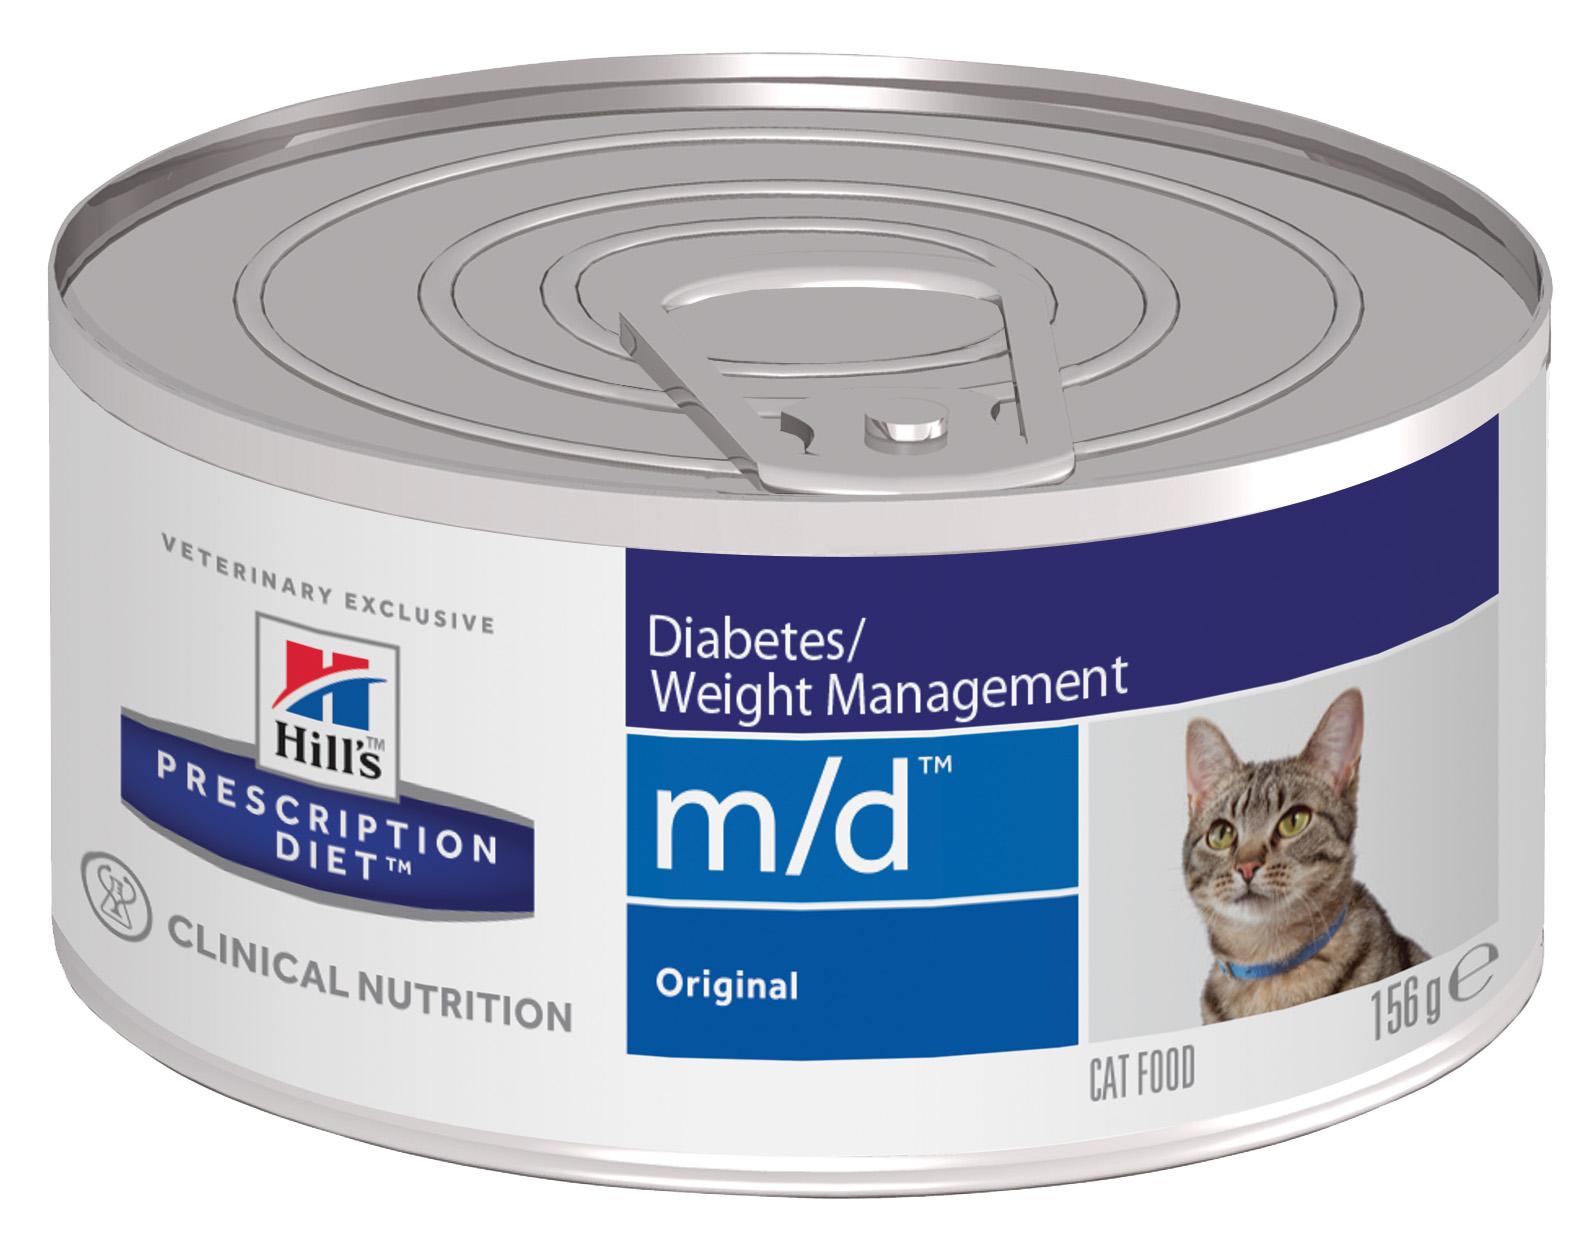 Консервы для кошек Hill\'s Prescription Diet m/d Diabetes/Weight Management, мясо, 156г